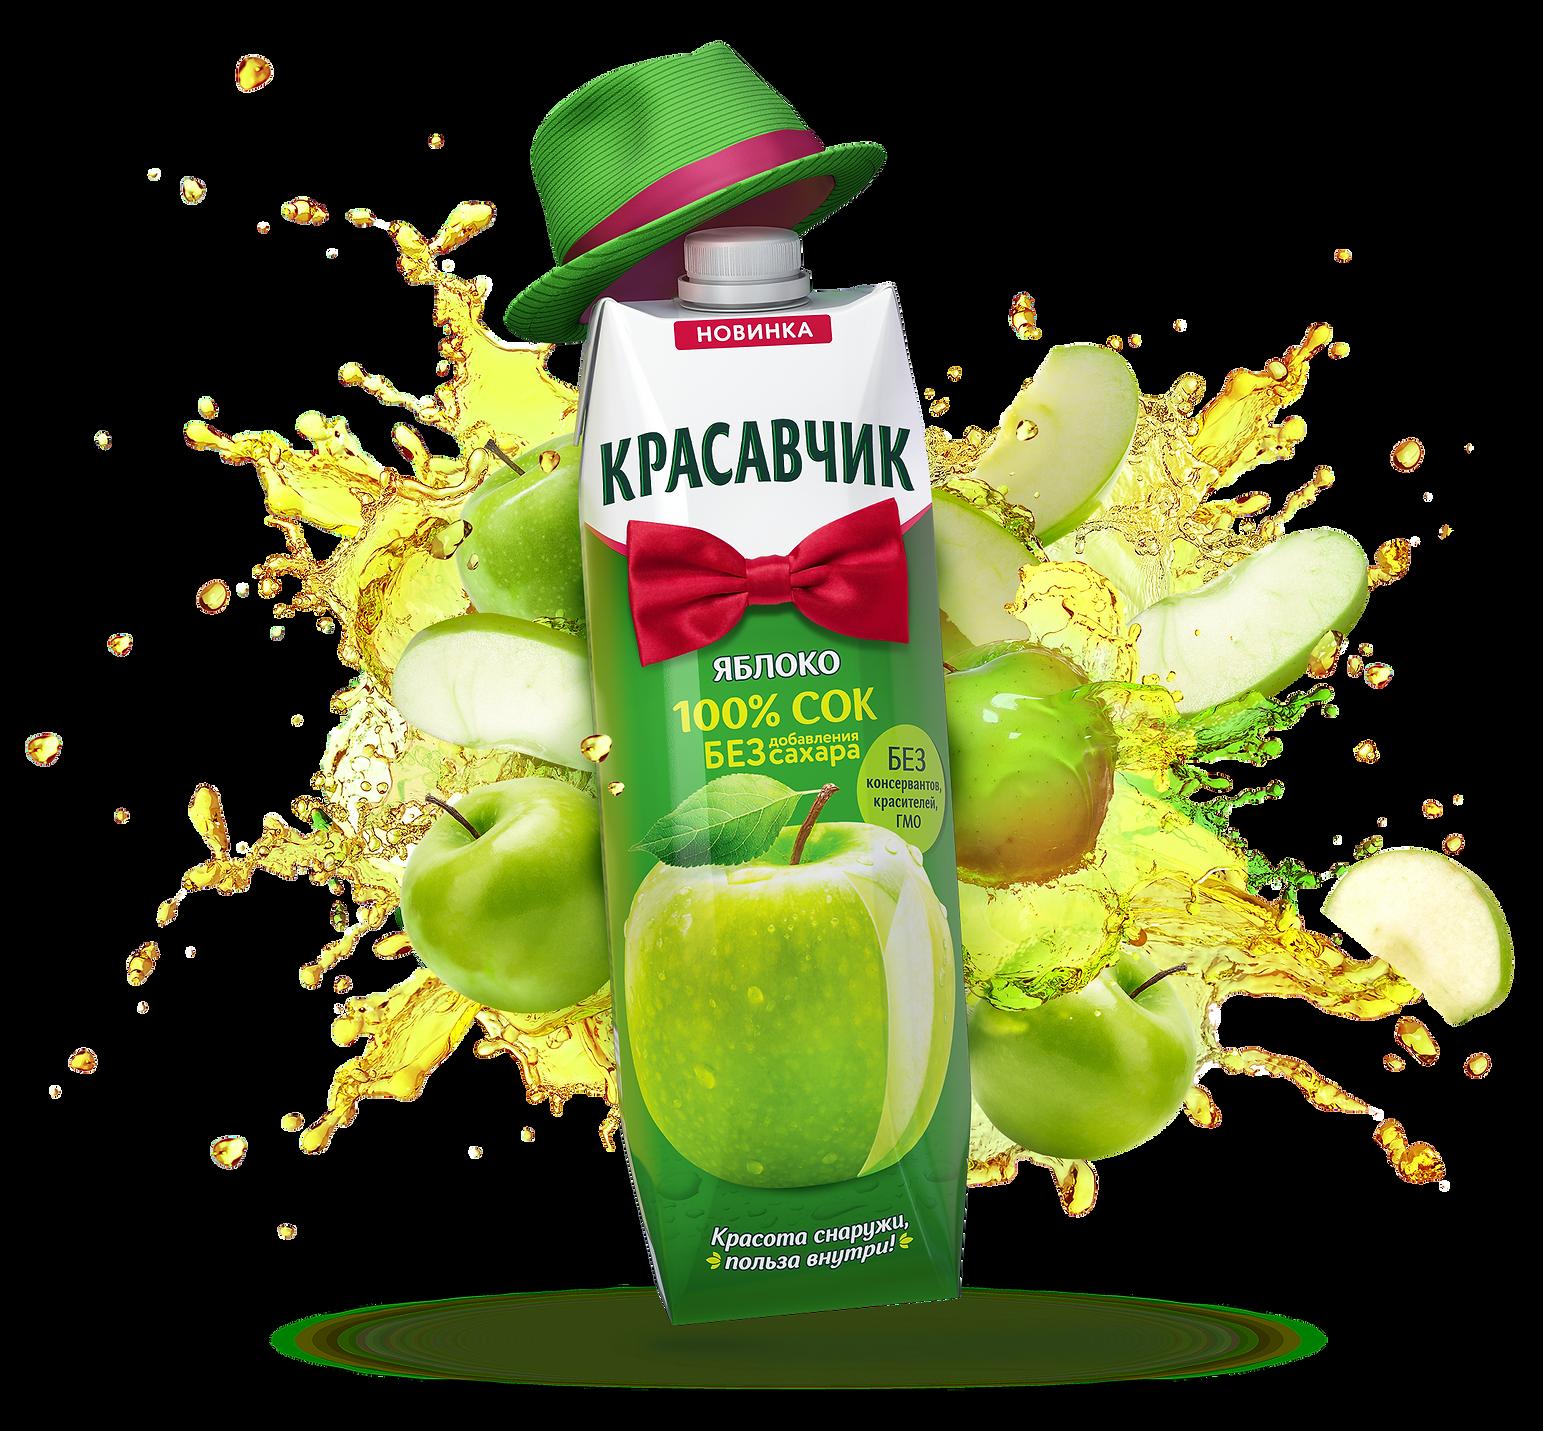 krasavchik-01.png